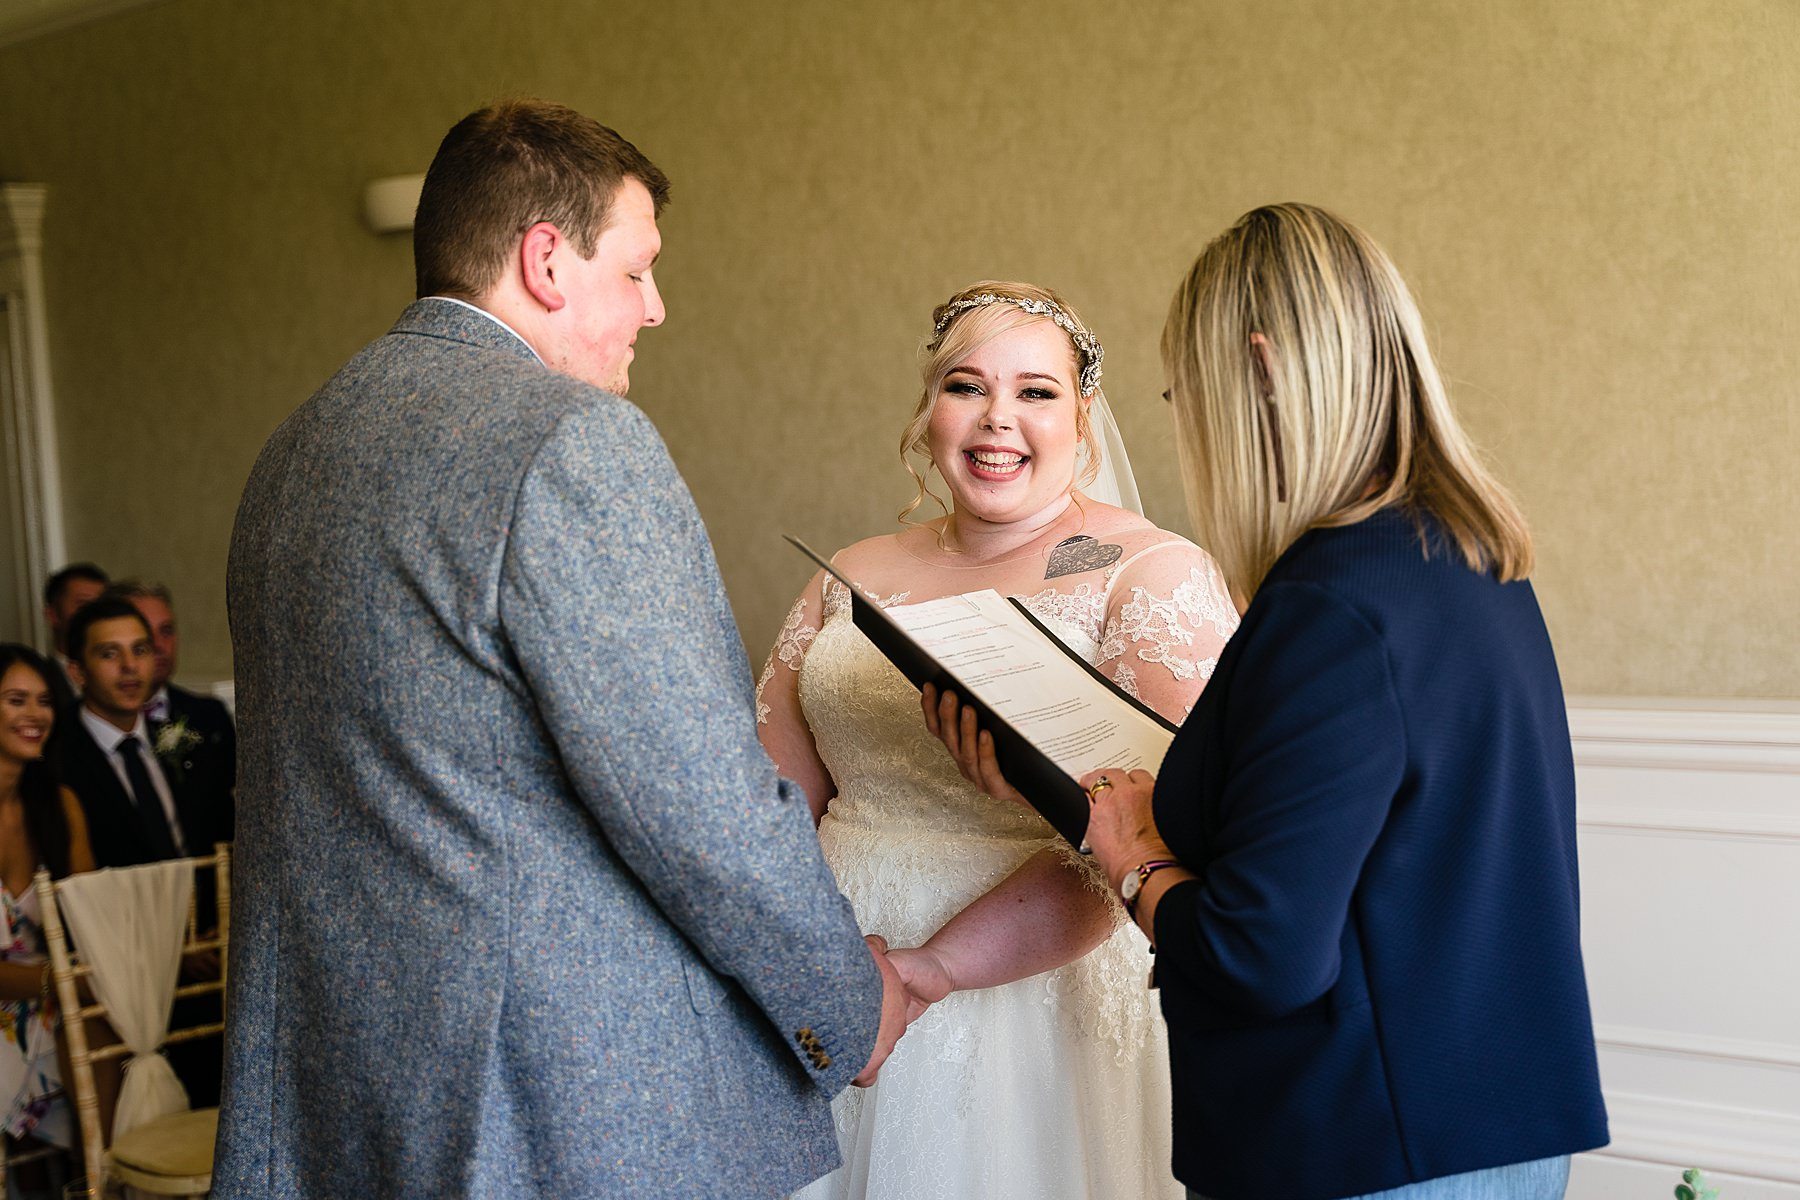 wedding ceremony at breadsall priory